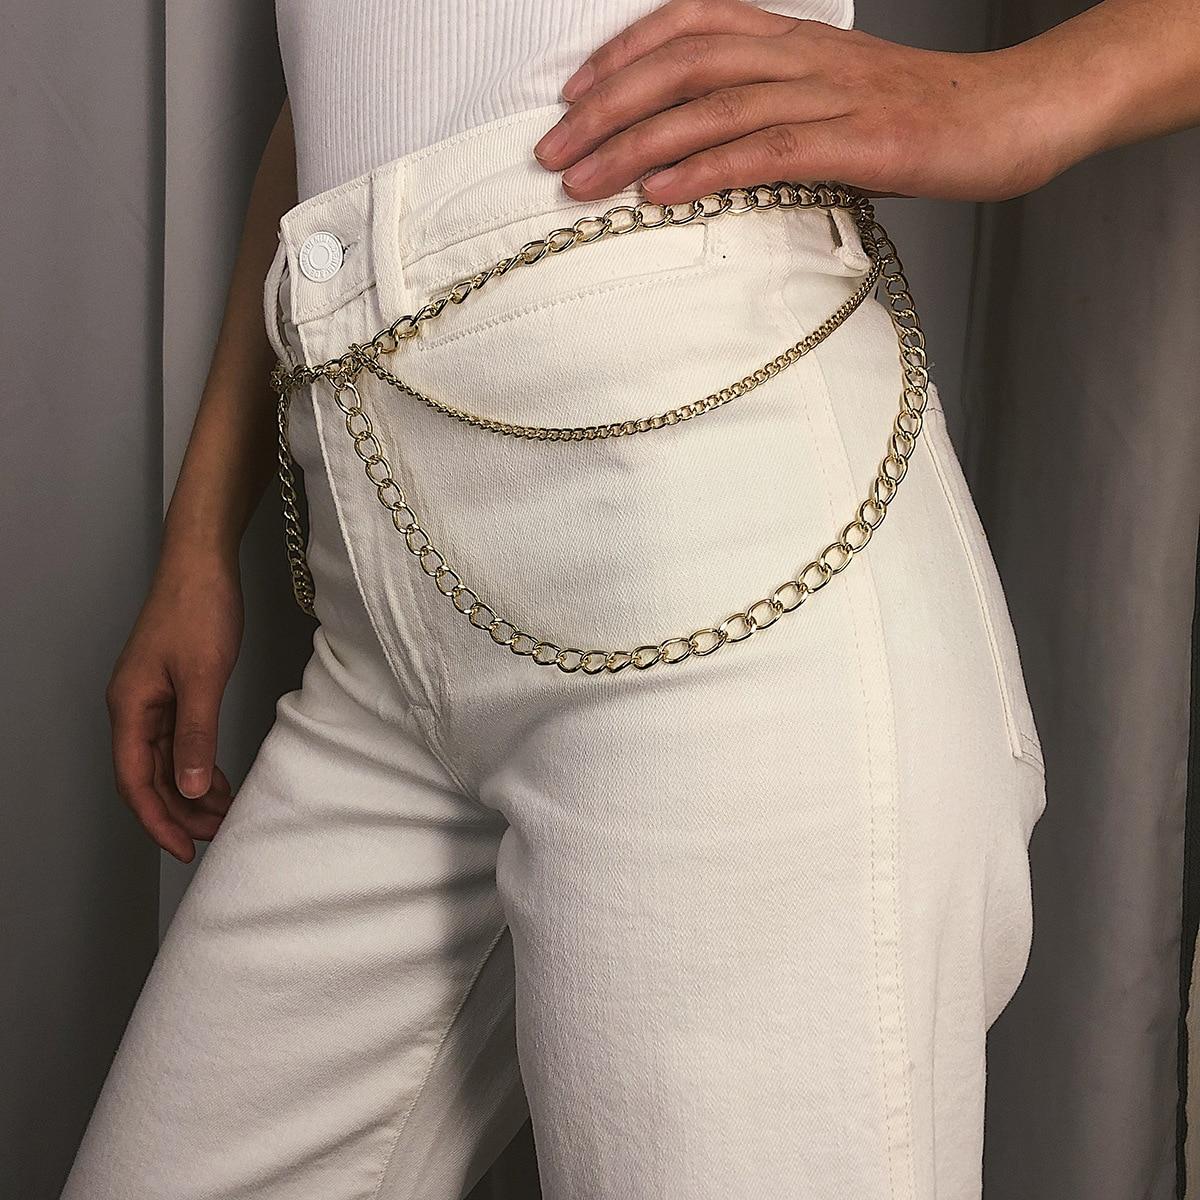 Body-Chain-Belt Jeans Belt Dress Waist-Chain Metal Female High-Quality Fashion Women